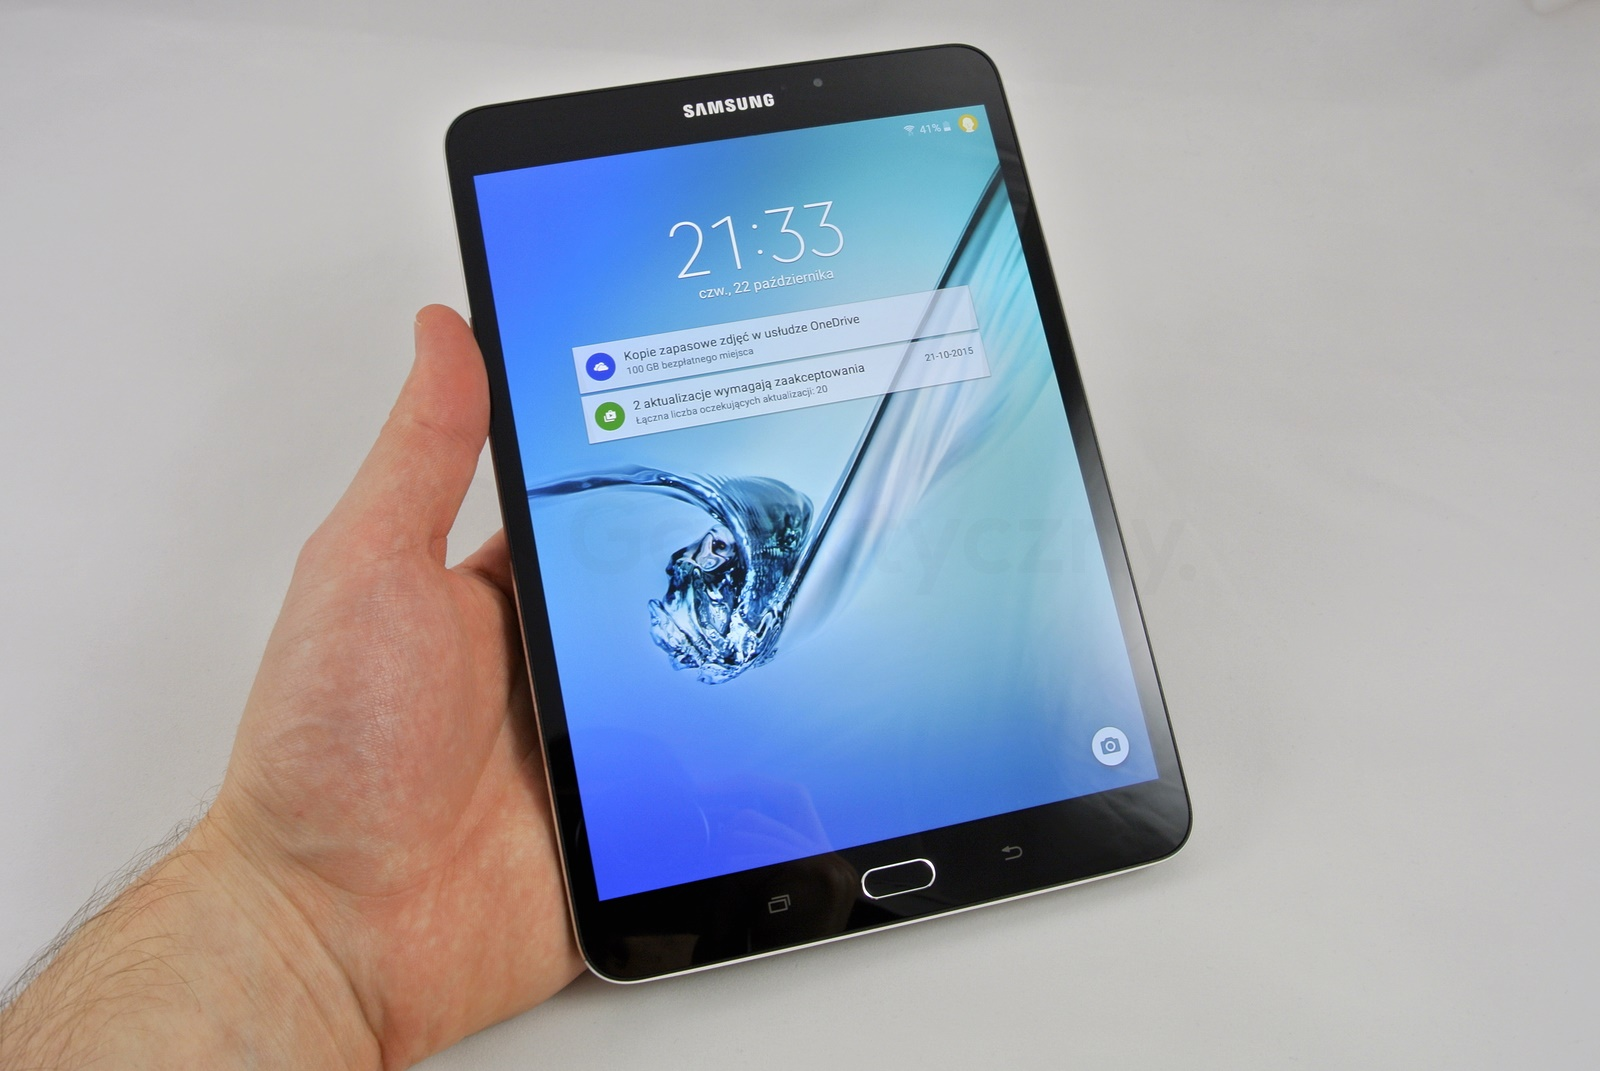 Samsung Galaxy Tab S2 8.0 / fot. galaktyczny